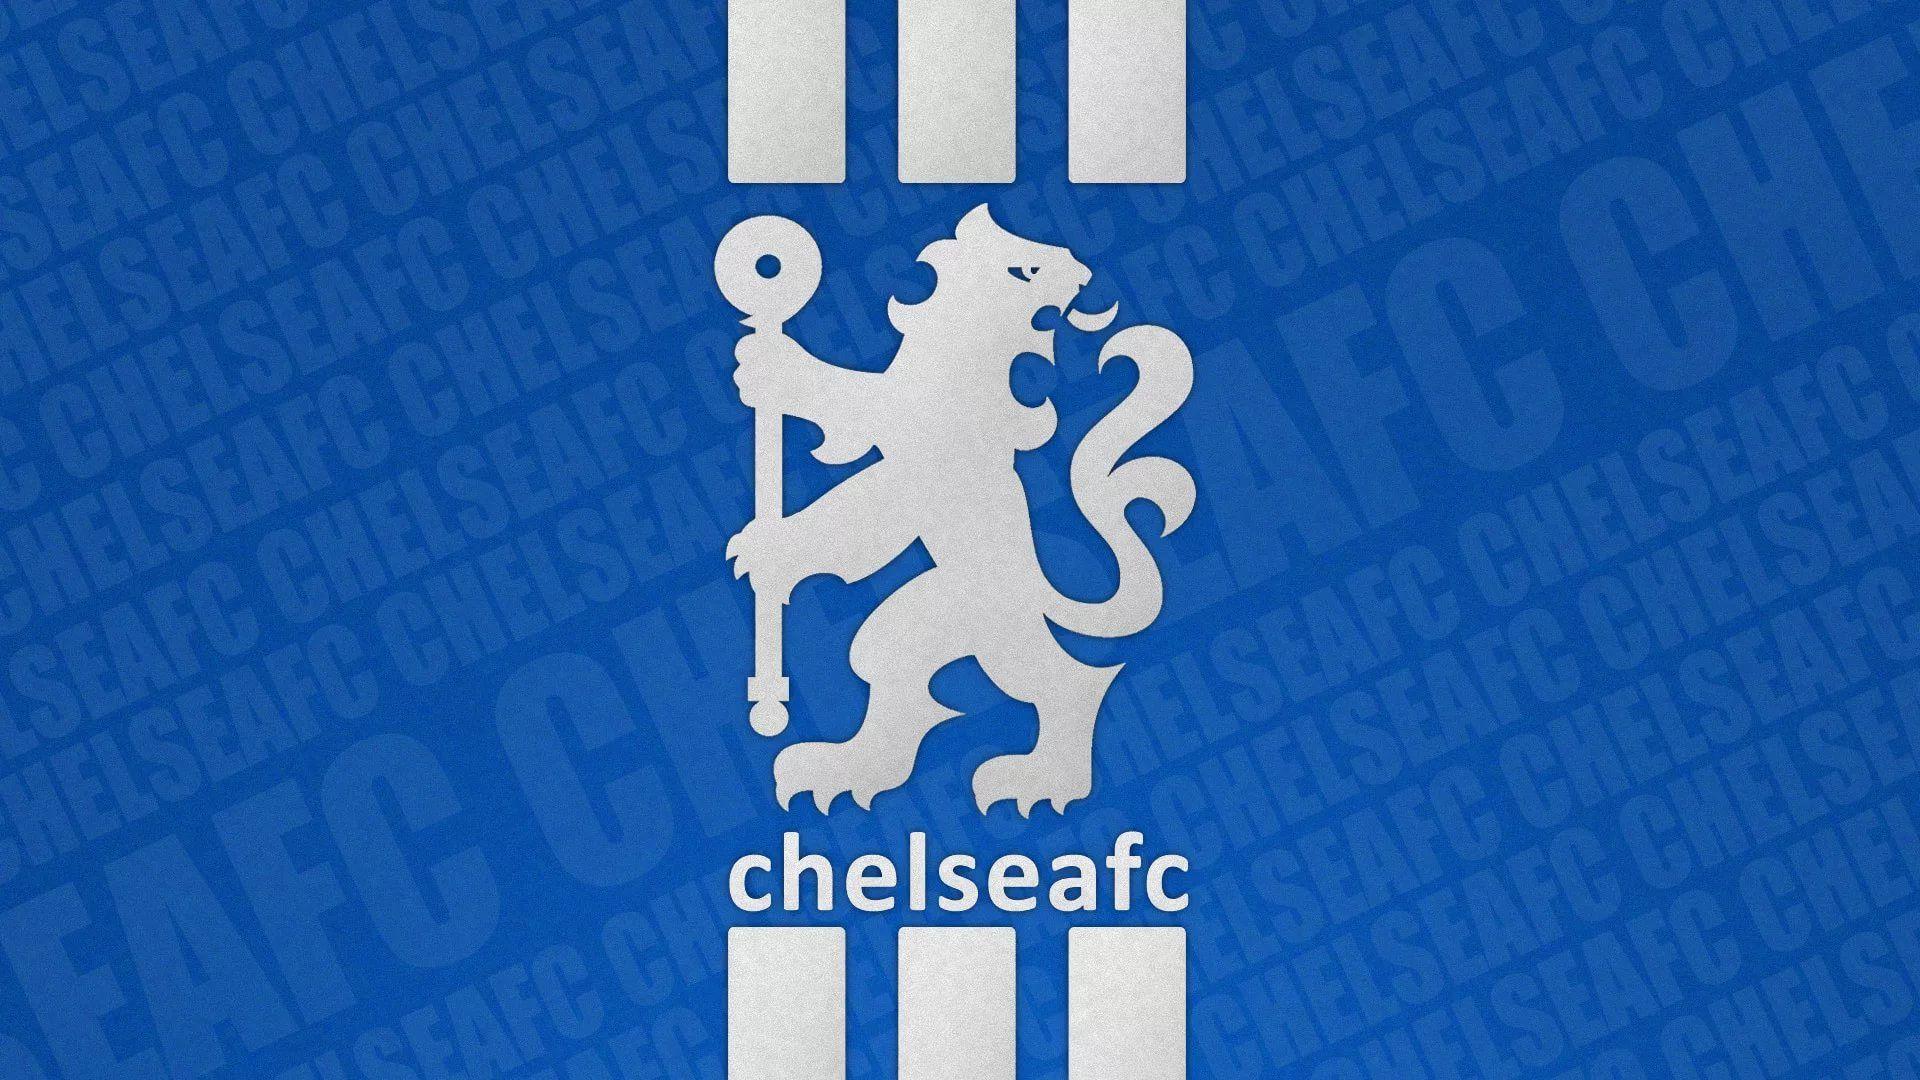 Chelsea a wallpaper